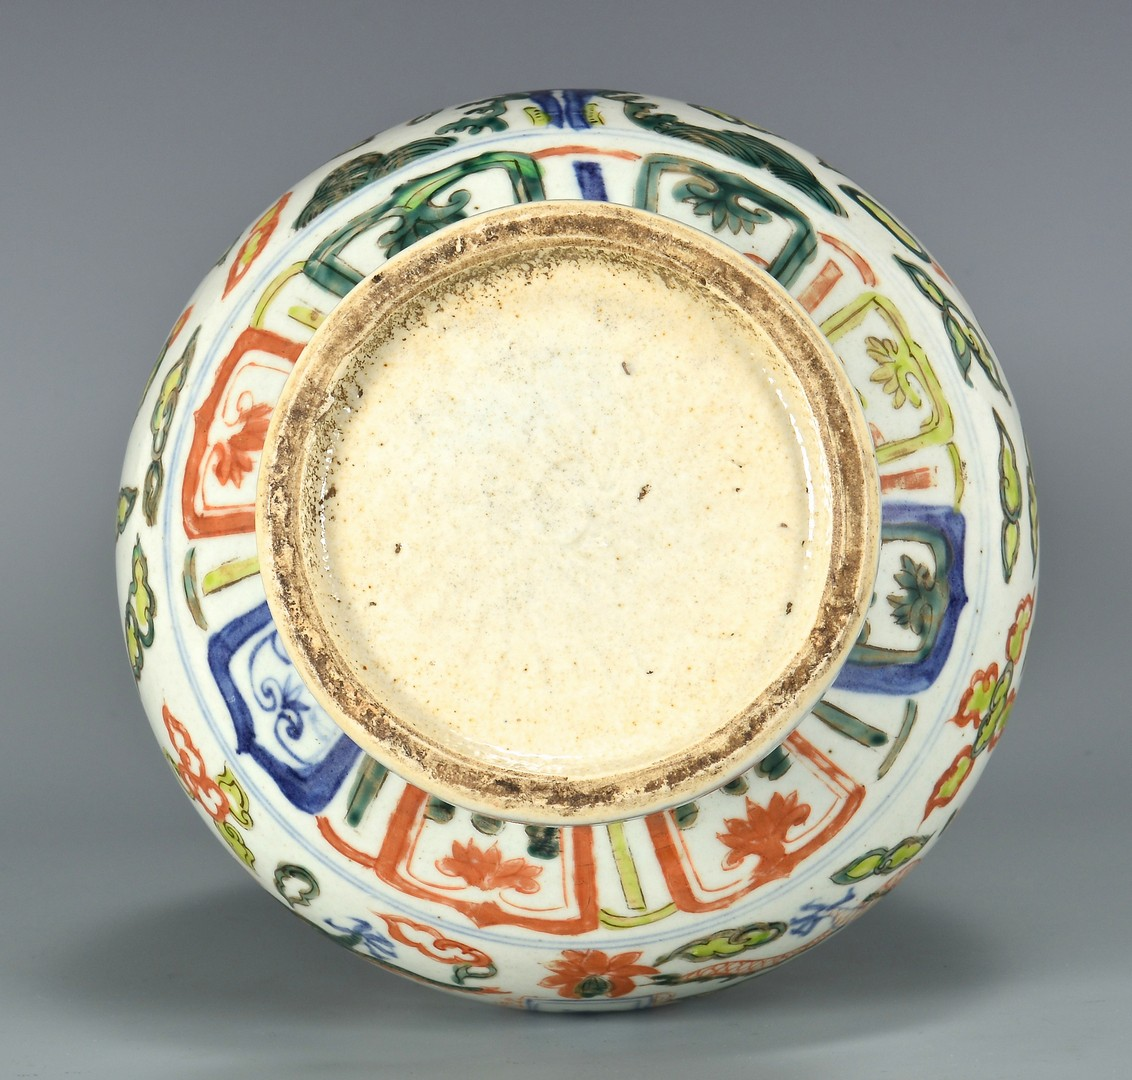 Lot 4010071: Famille Verte Vase with Inscriptions